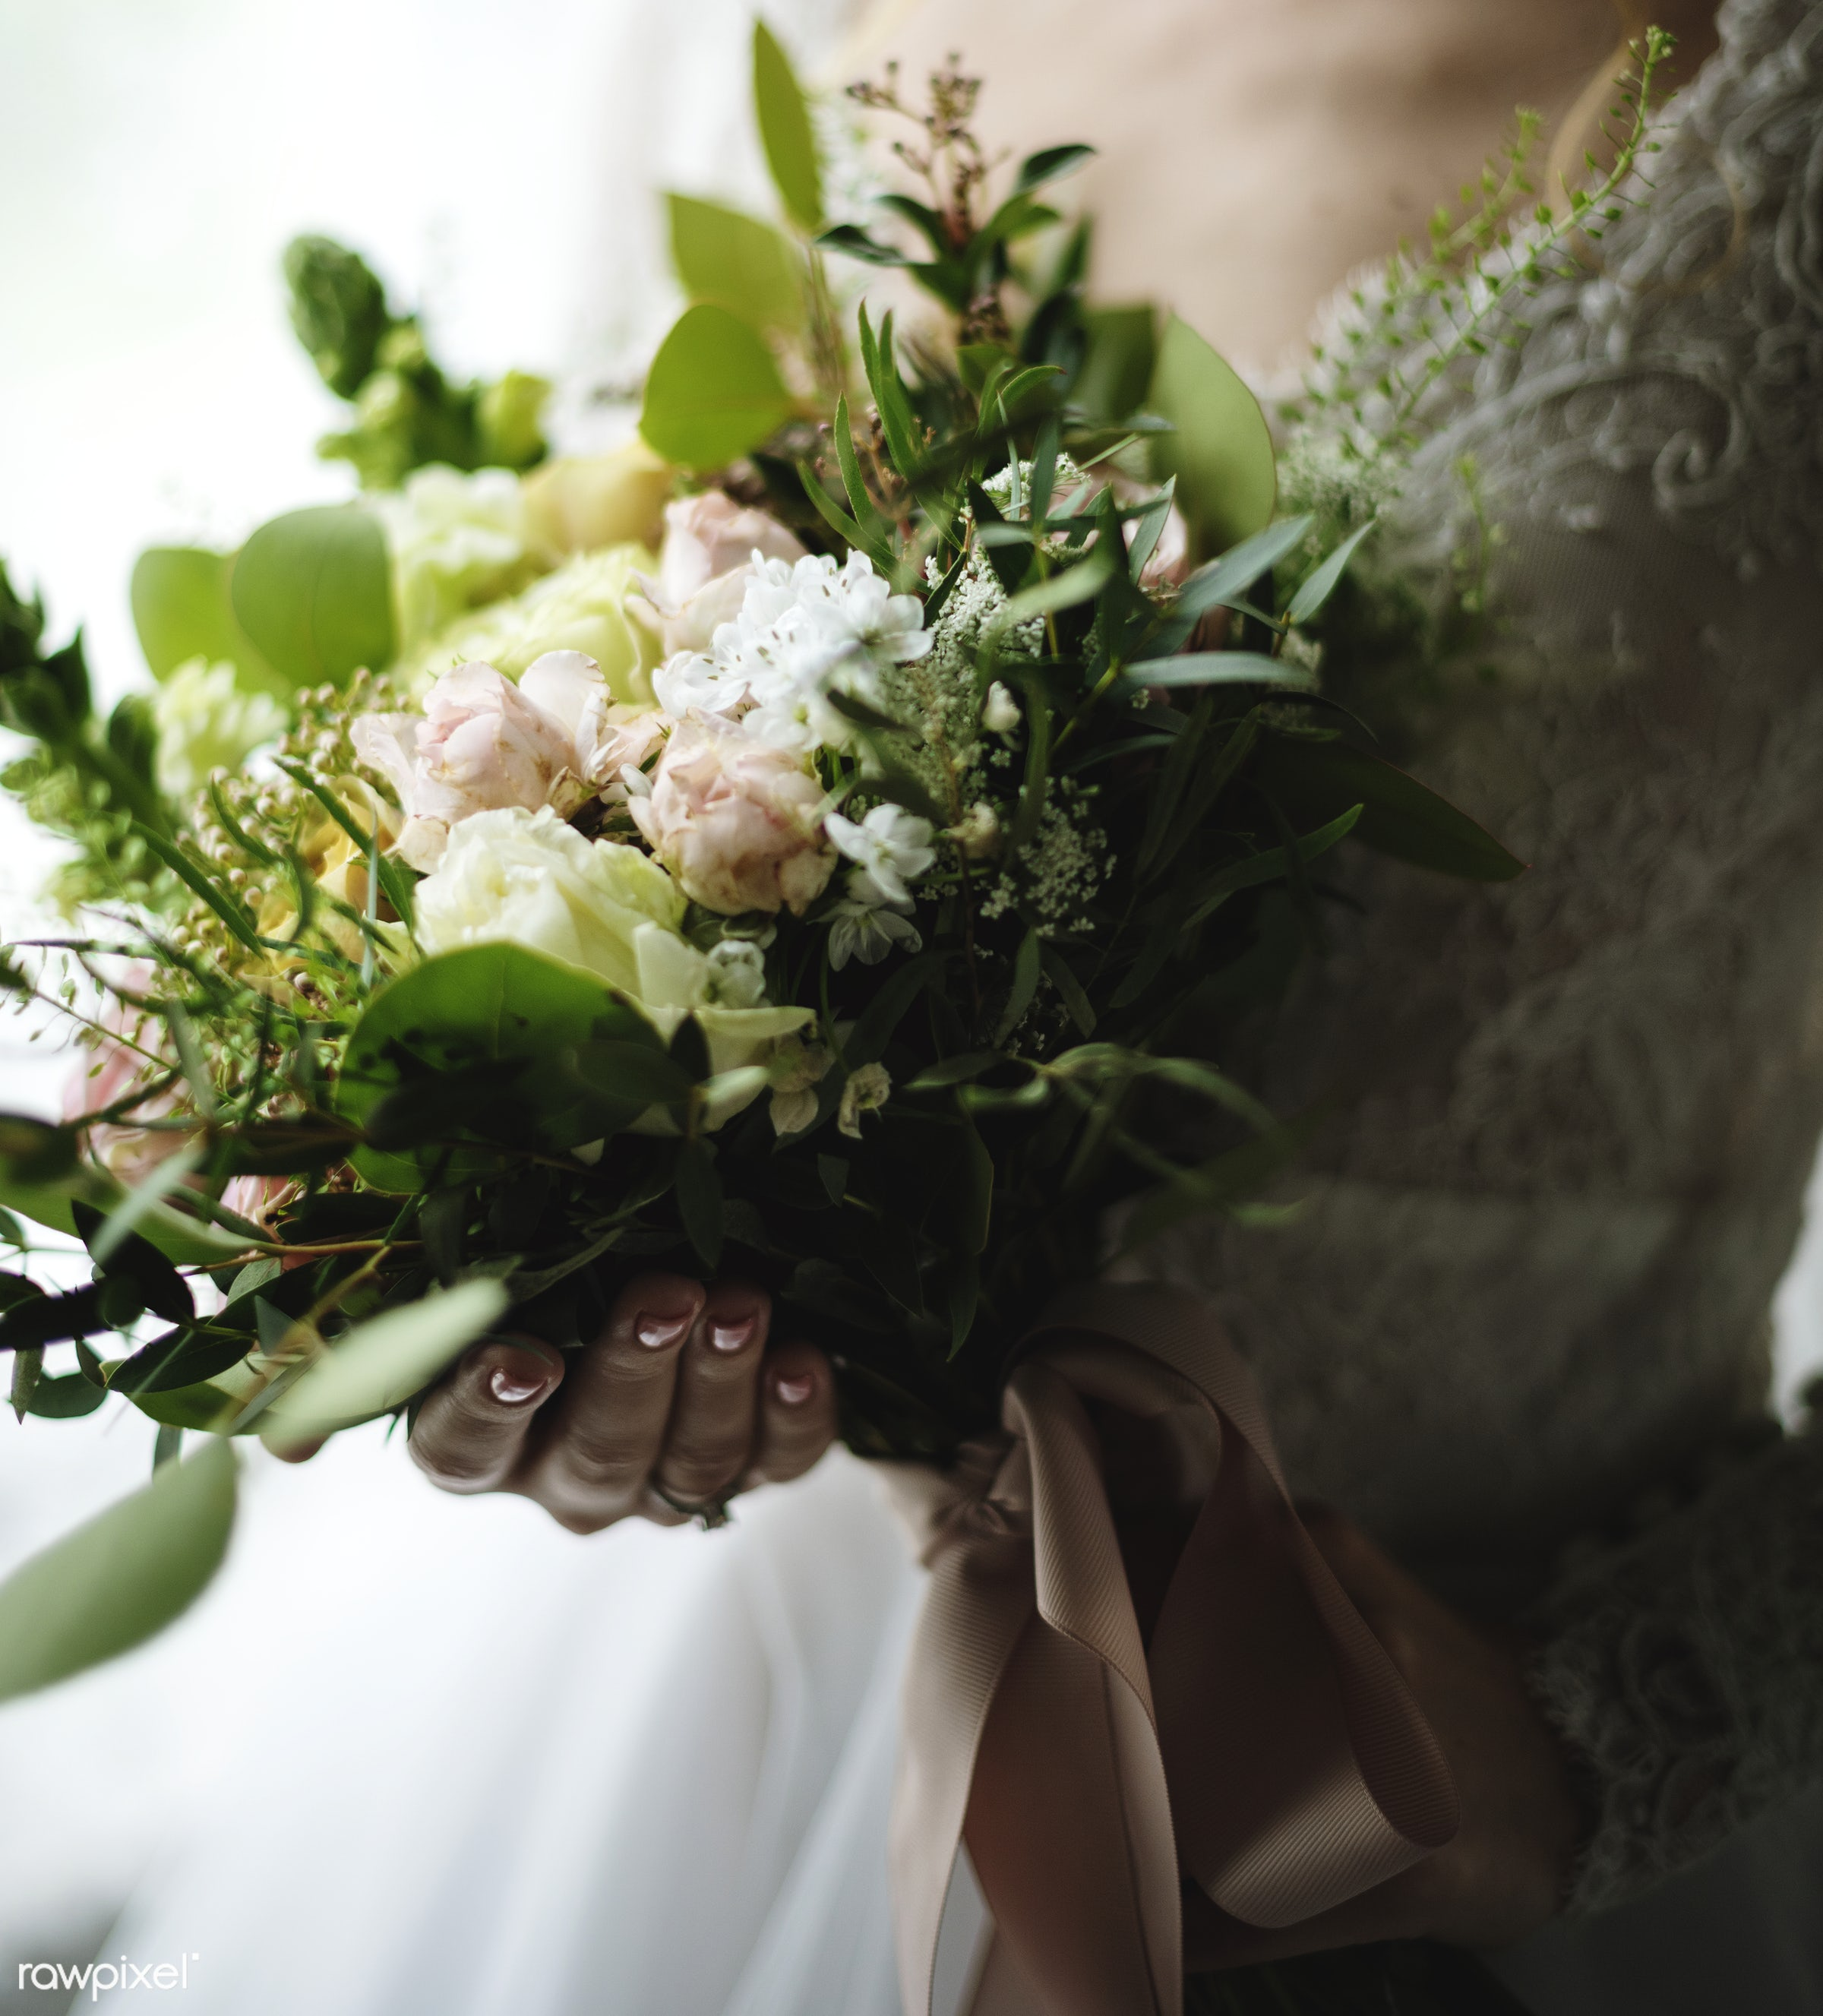 Attractive Beautiful Bride Holding Flowers Bouquet - wedding, adult, attractive, beautiful, bouquet, bridal, bride,...